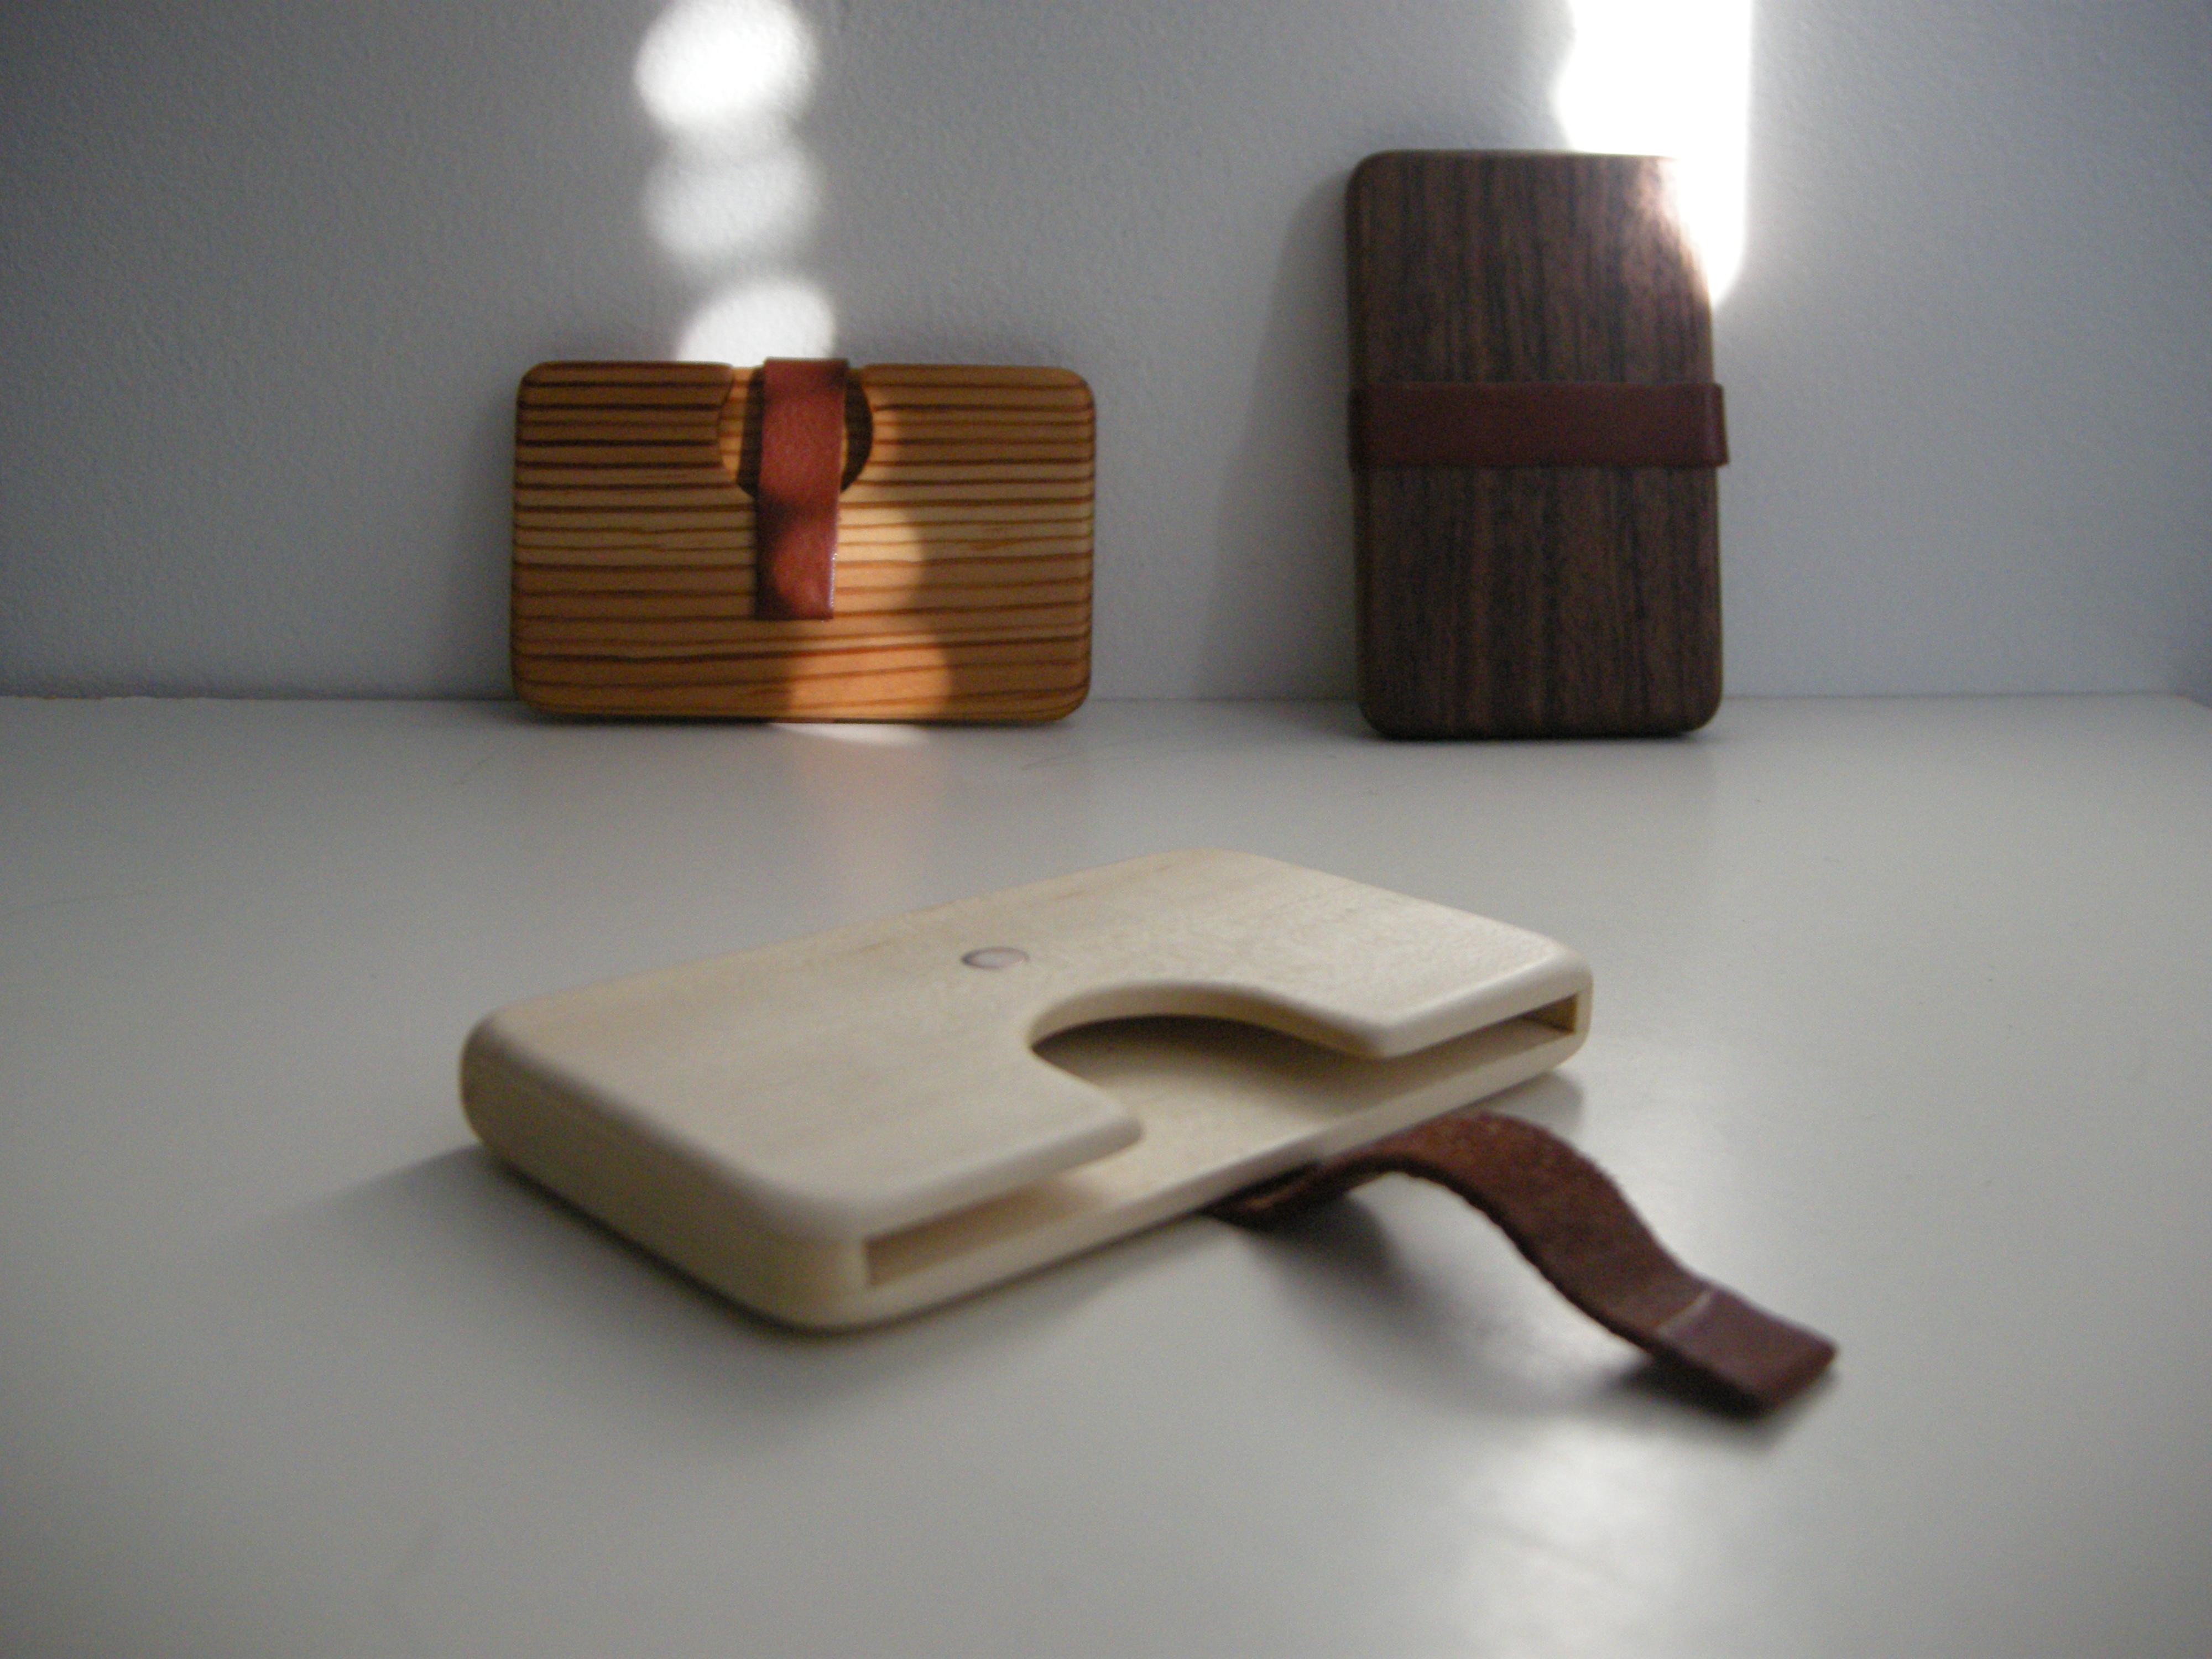 Woodshop projects with secret compartments uk